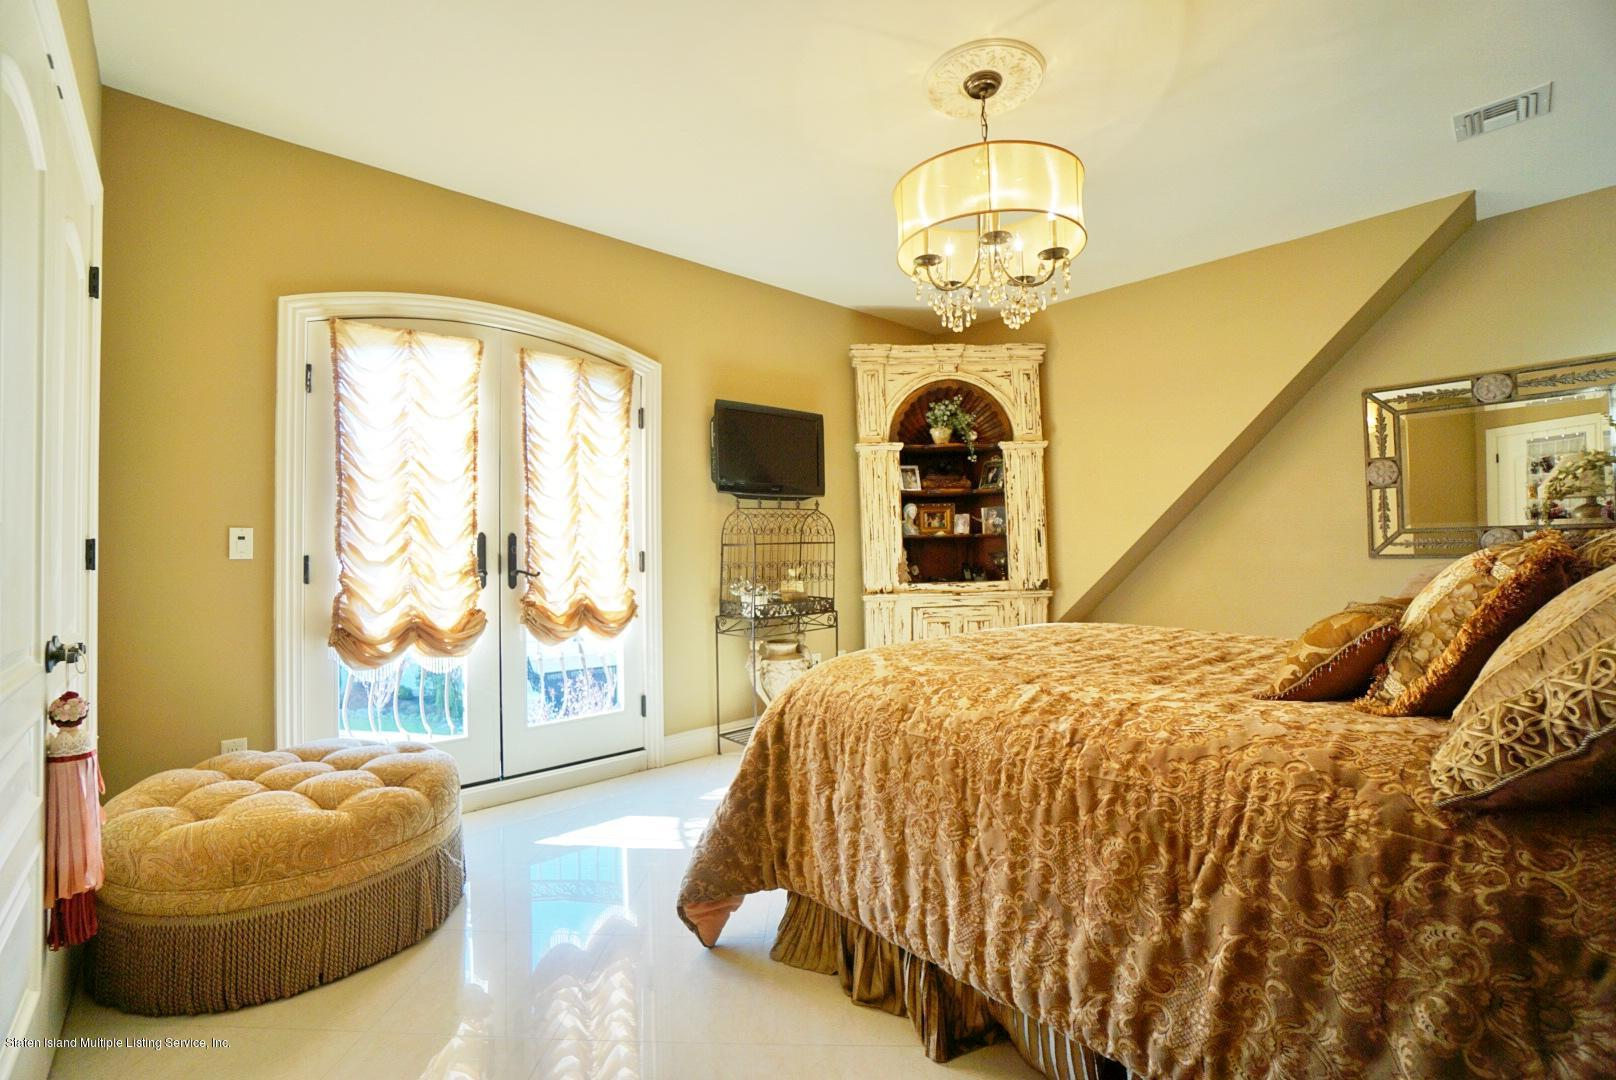 45 Blackhorse Court,Staten Island,New York,10306,United States,3 Bedrooms Bedrooms,9 Rooms Rooms,4 BathroomsBathrooms,Residential,Blackhorse,1133685